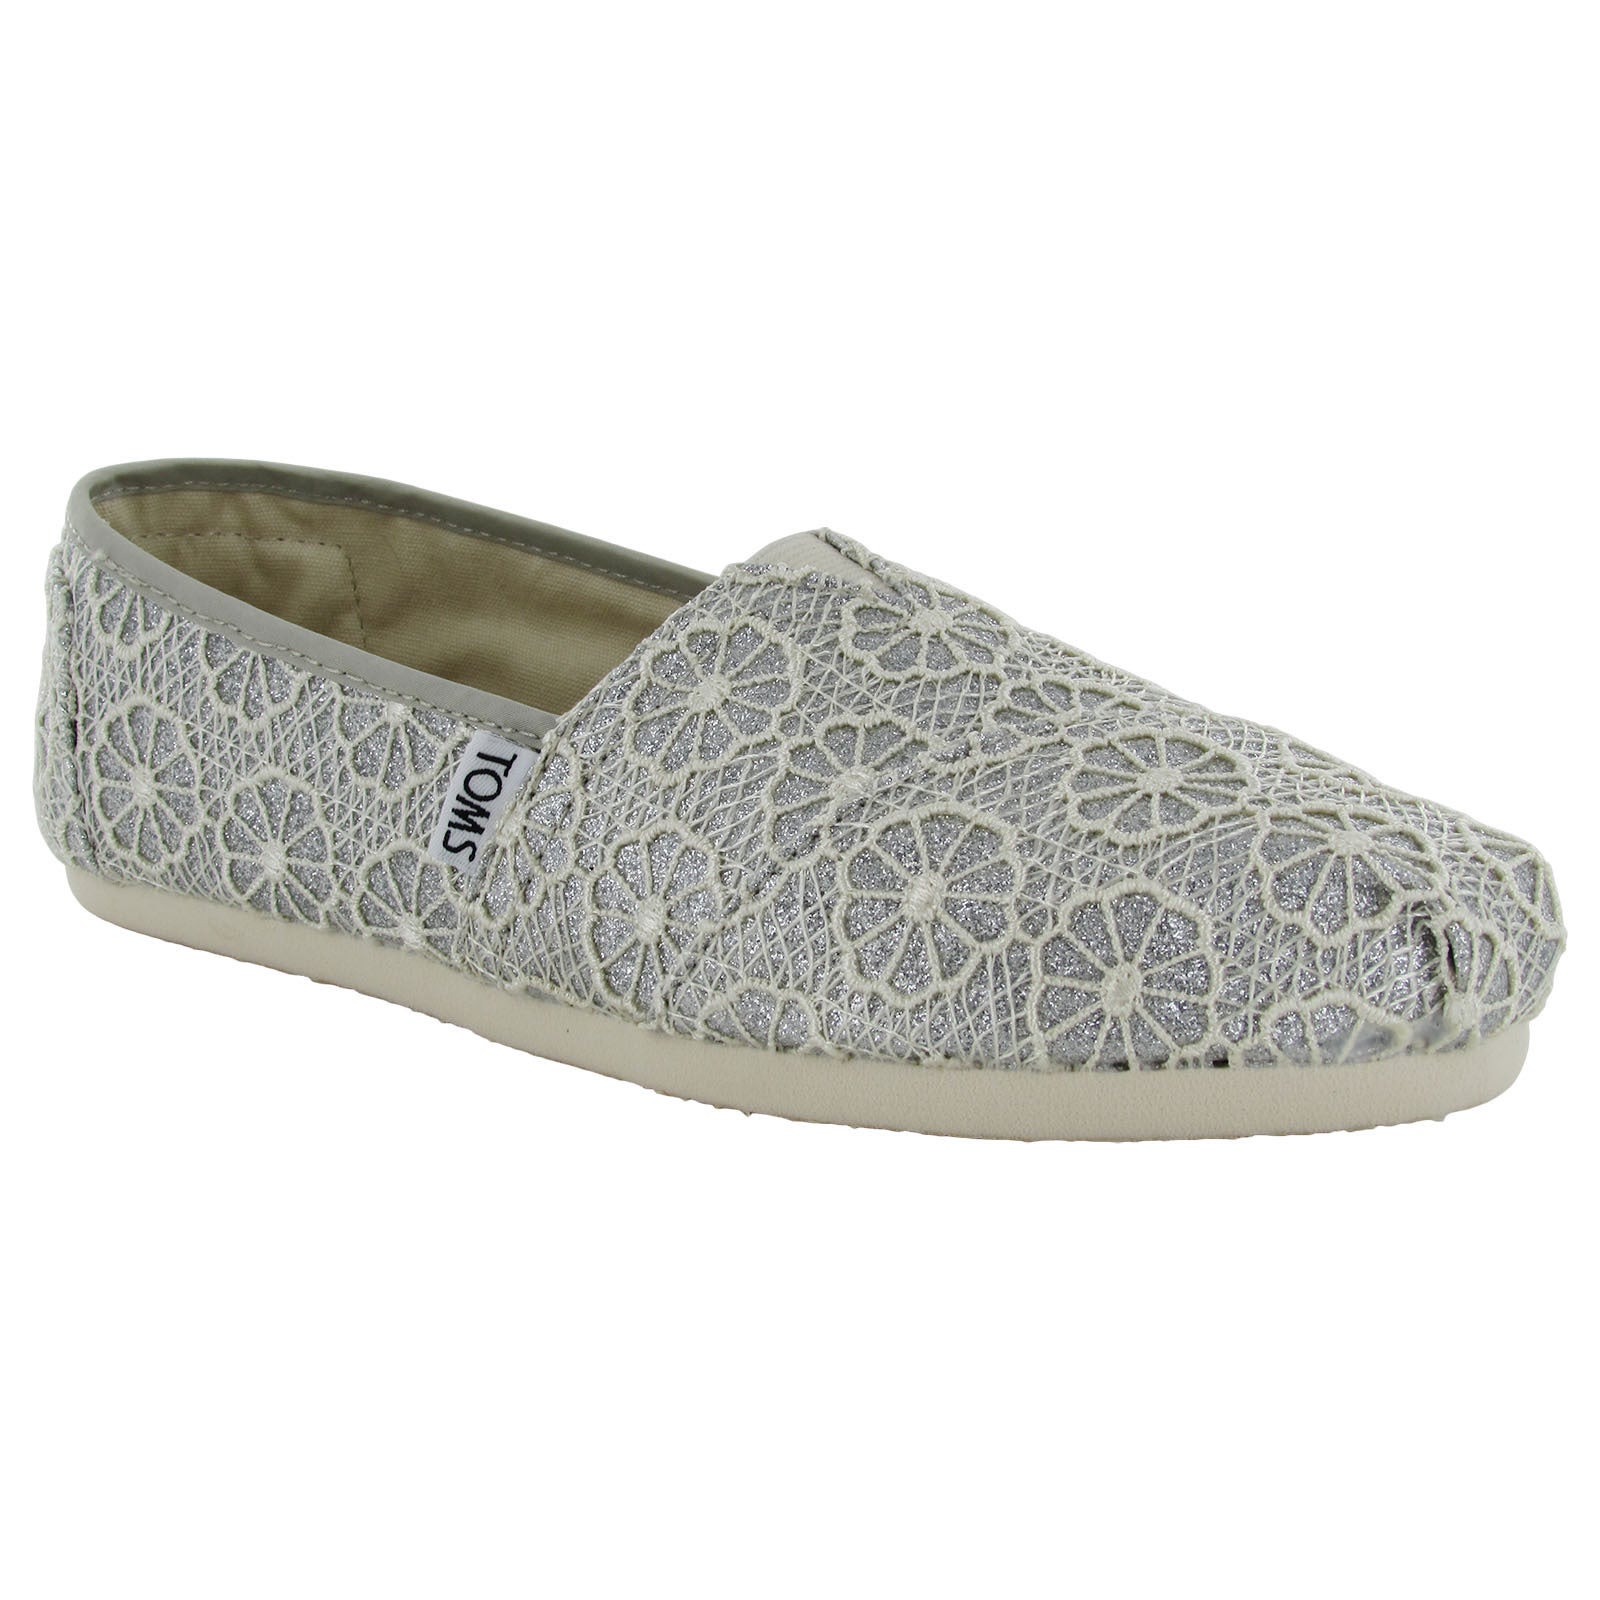 f2bdf59adcf Shop Toms Women s Crochet Glitter Slip On Alpargata Flat Shoes - Free  Shipping Today - Overstock - 11467907